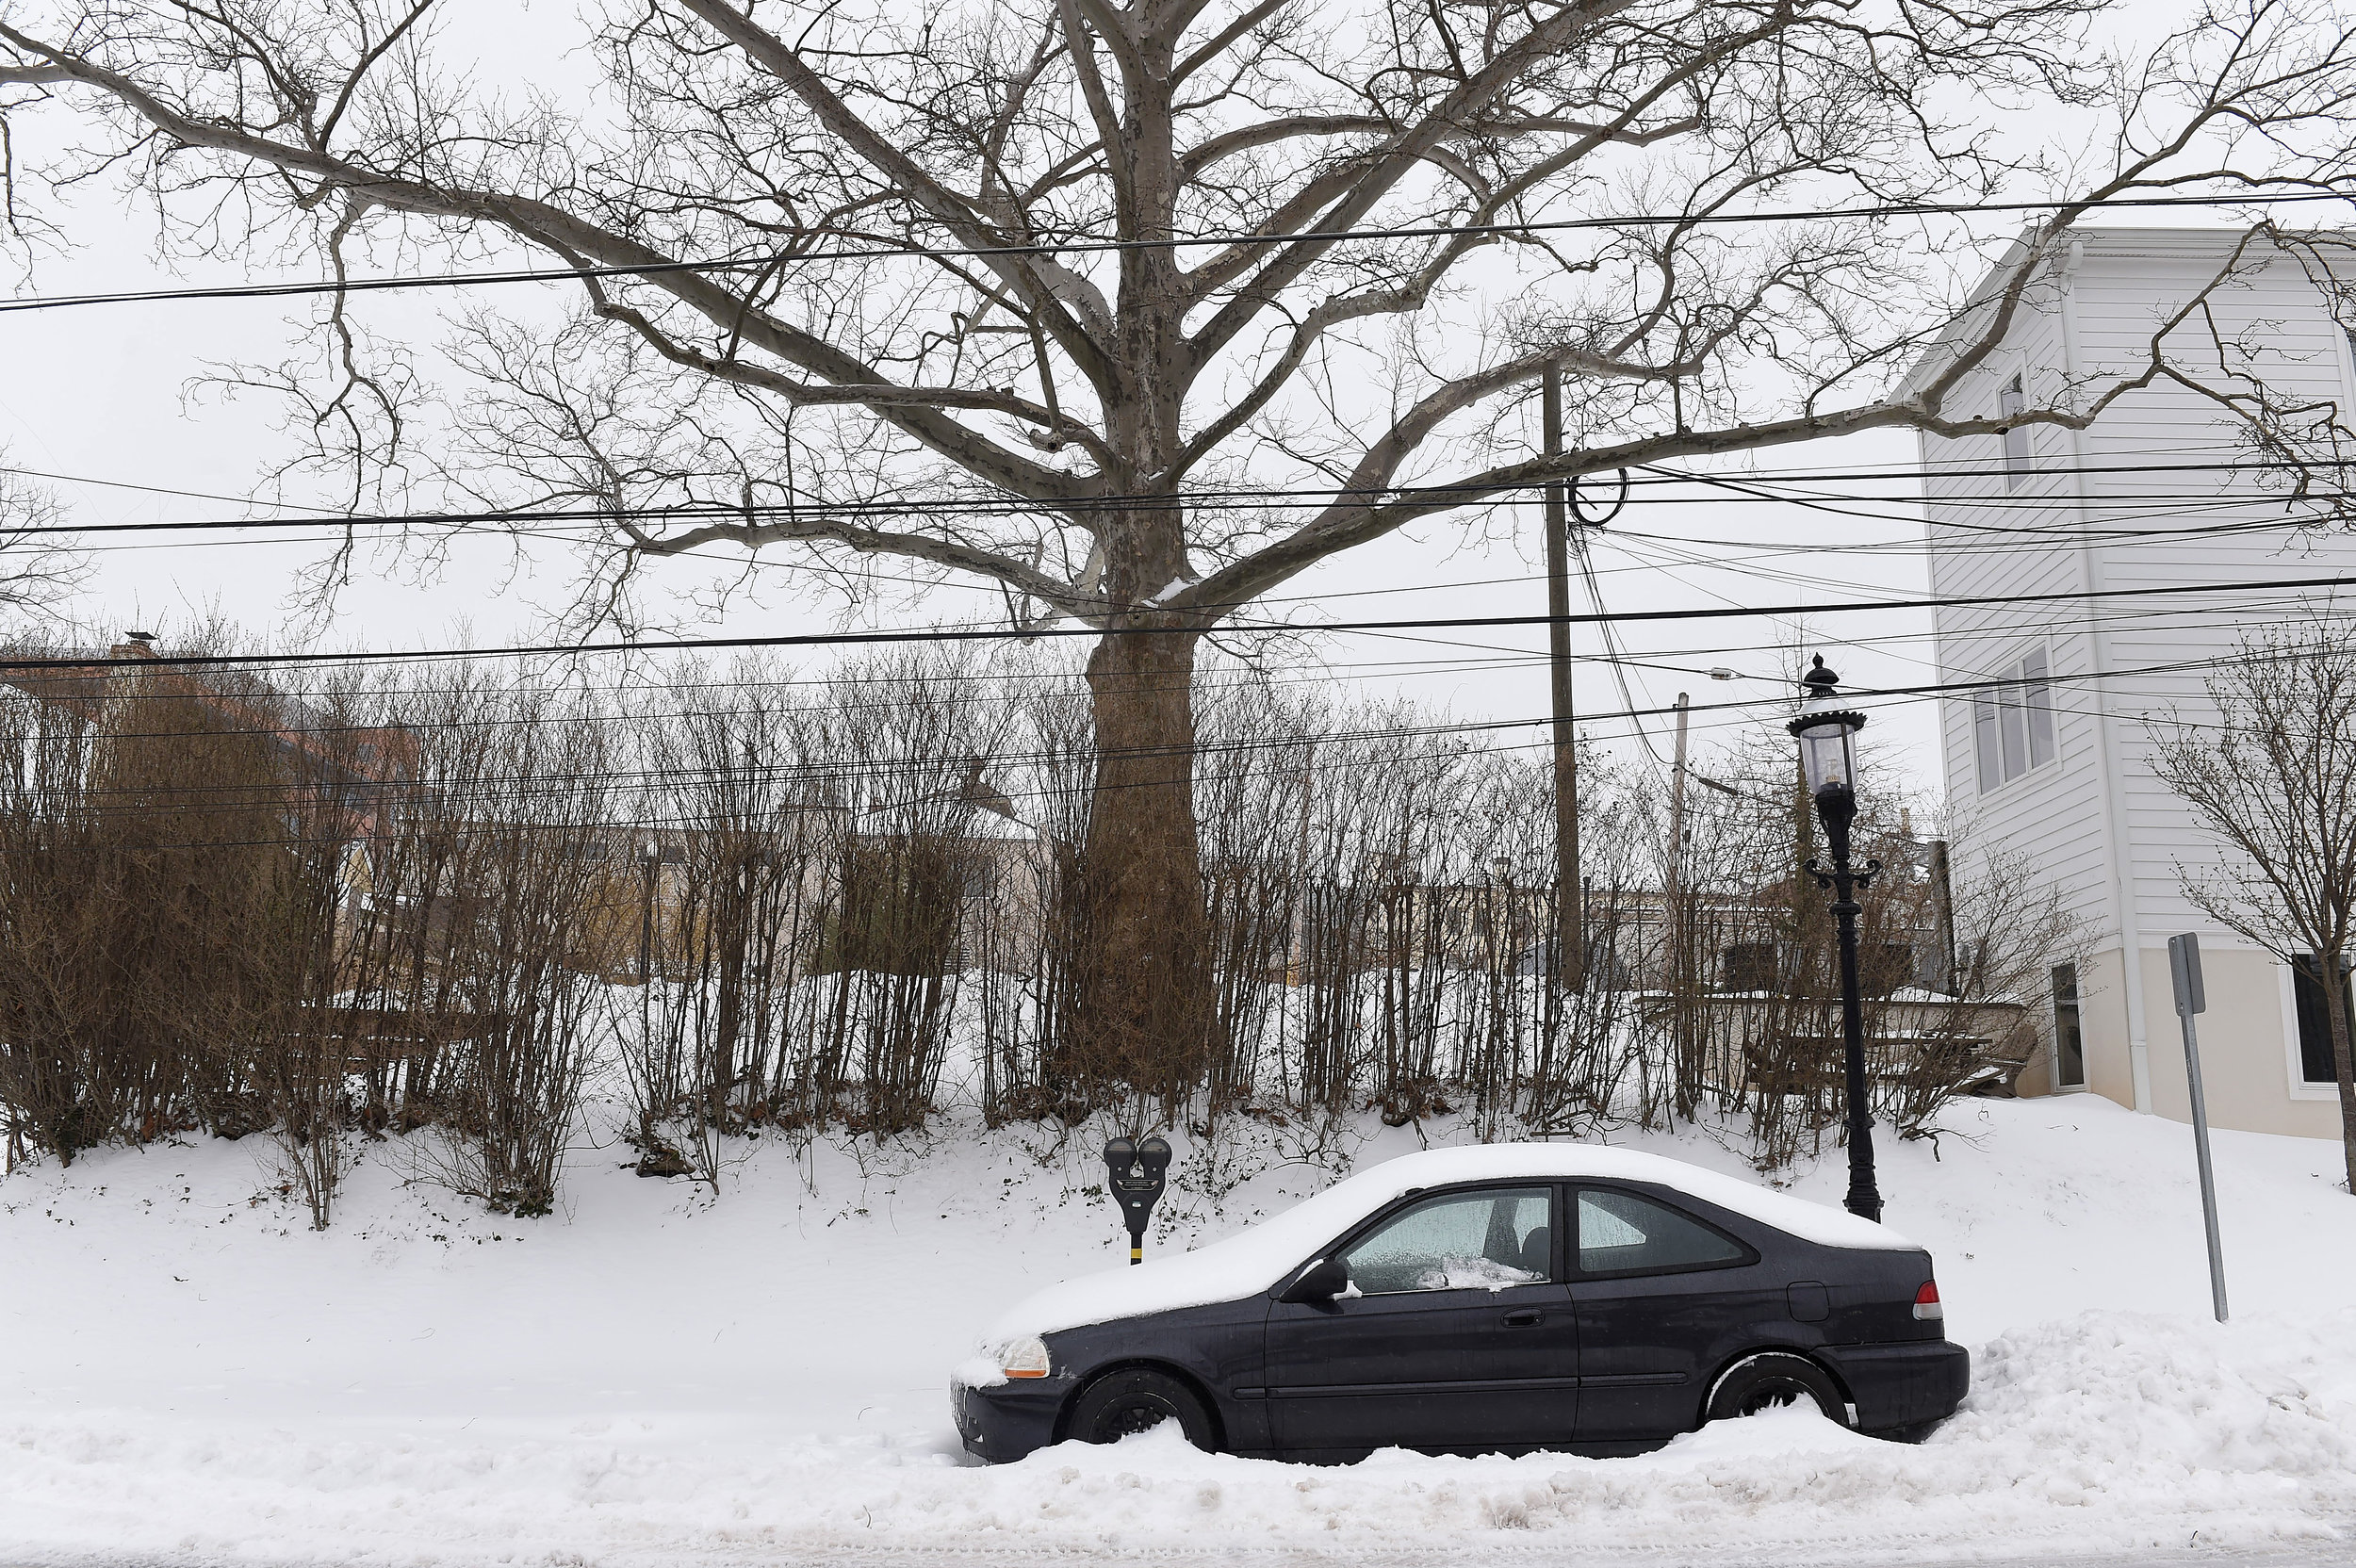 031517dl snow pics 18 ce.JPG